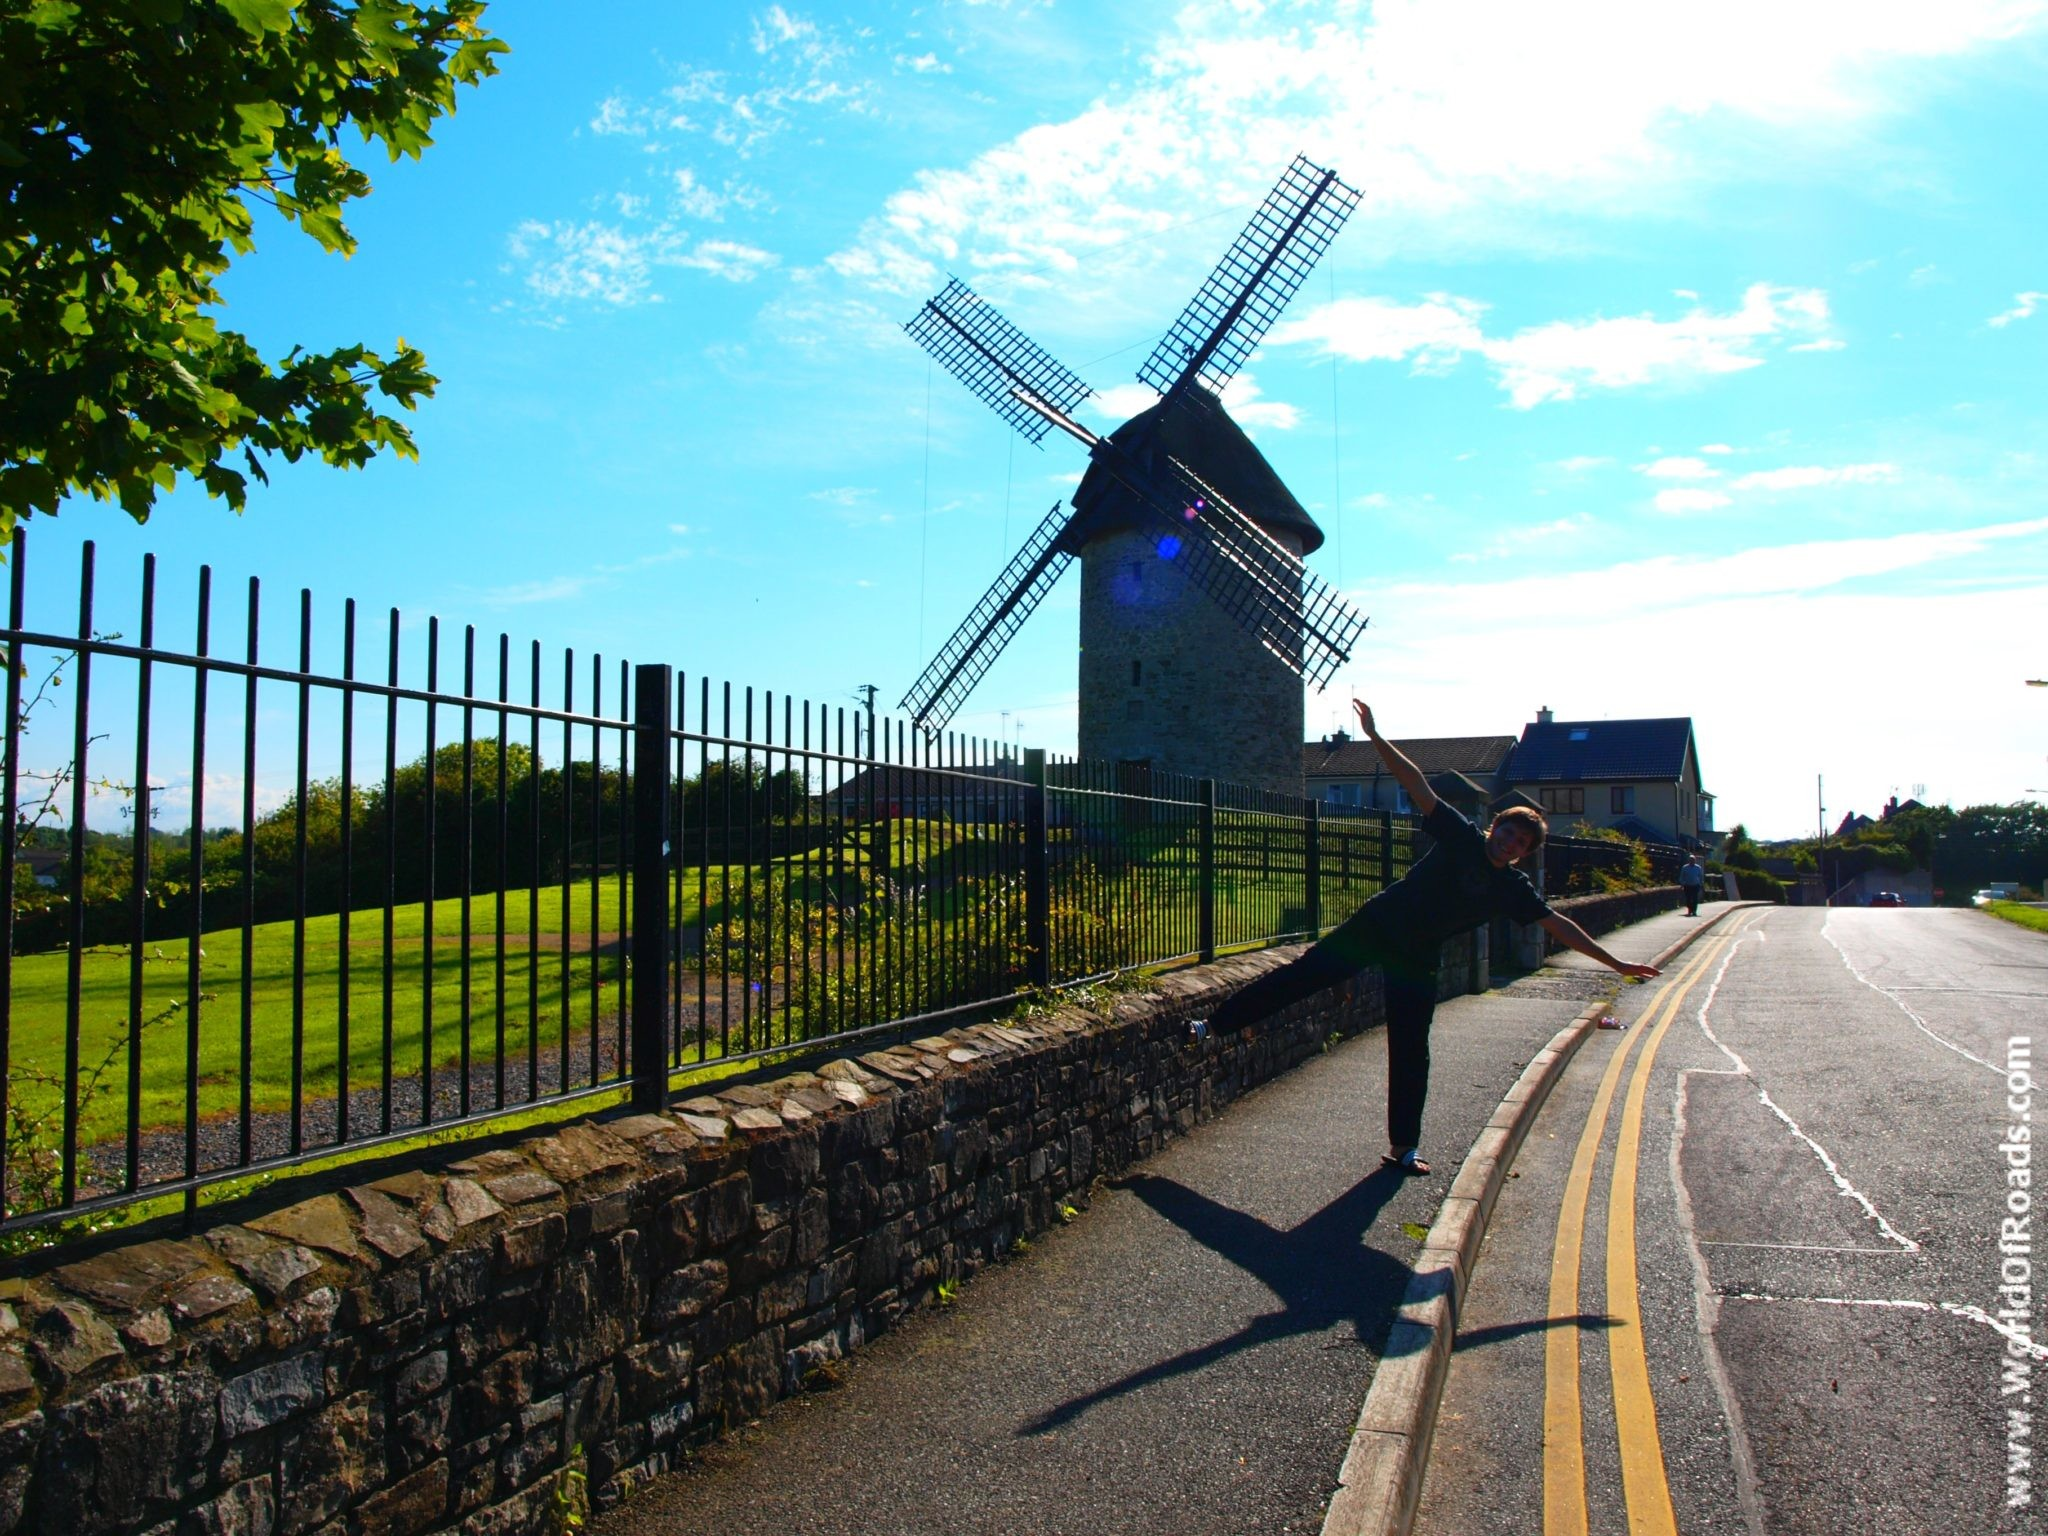 Мельницы Скерриес. (Skerries windmills). Ирландия